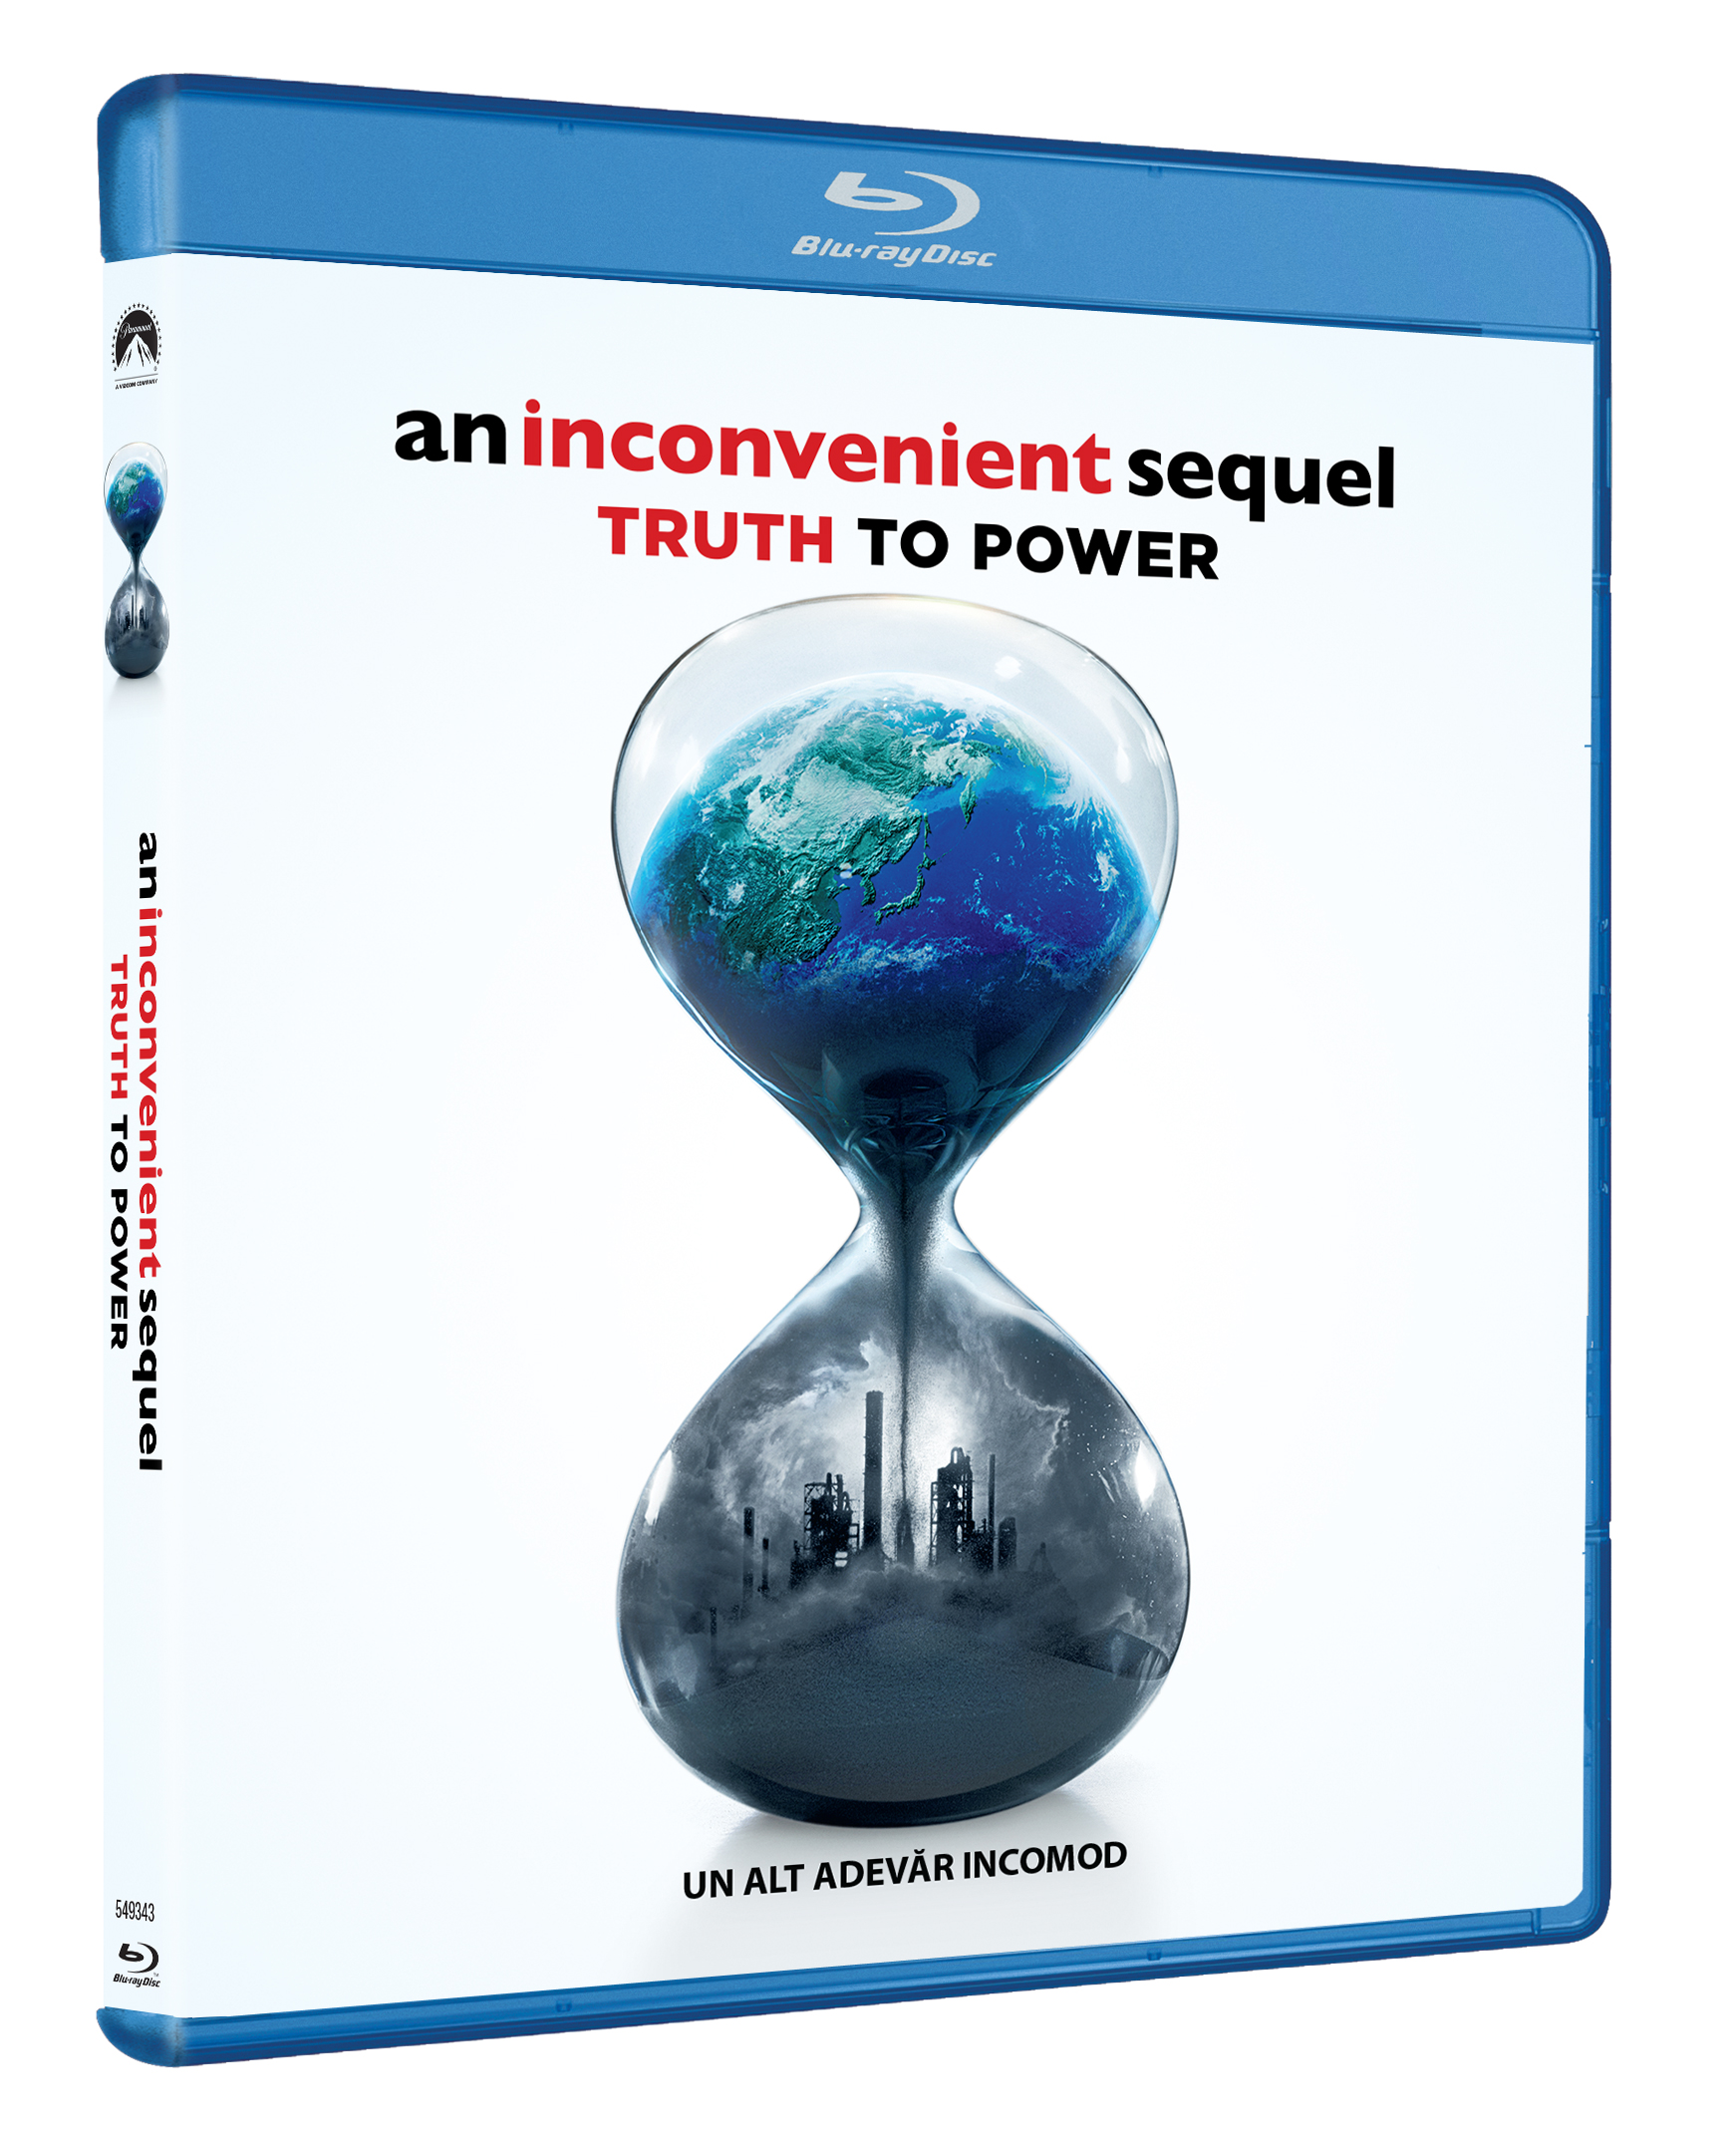 Un alt adevar incomod (Blu Ray Disc) / An Inconvenient Sequel - Truth to Power